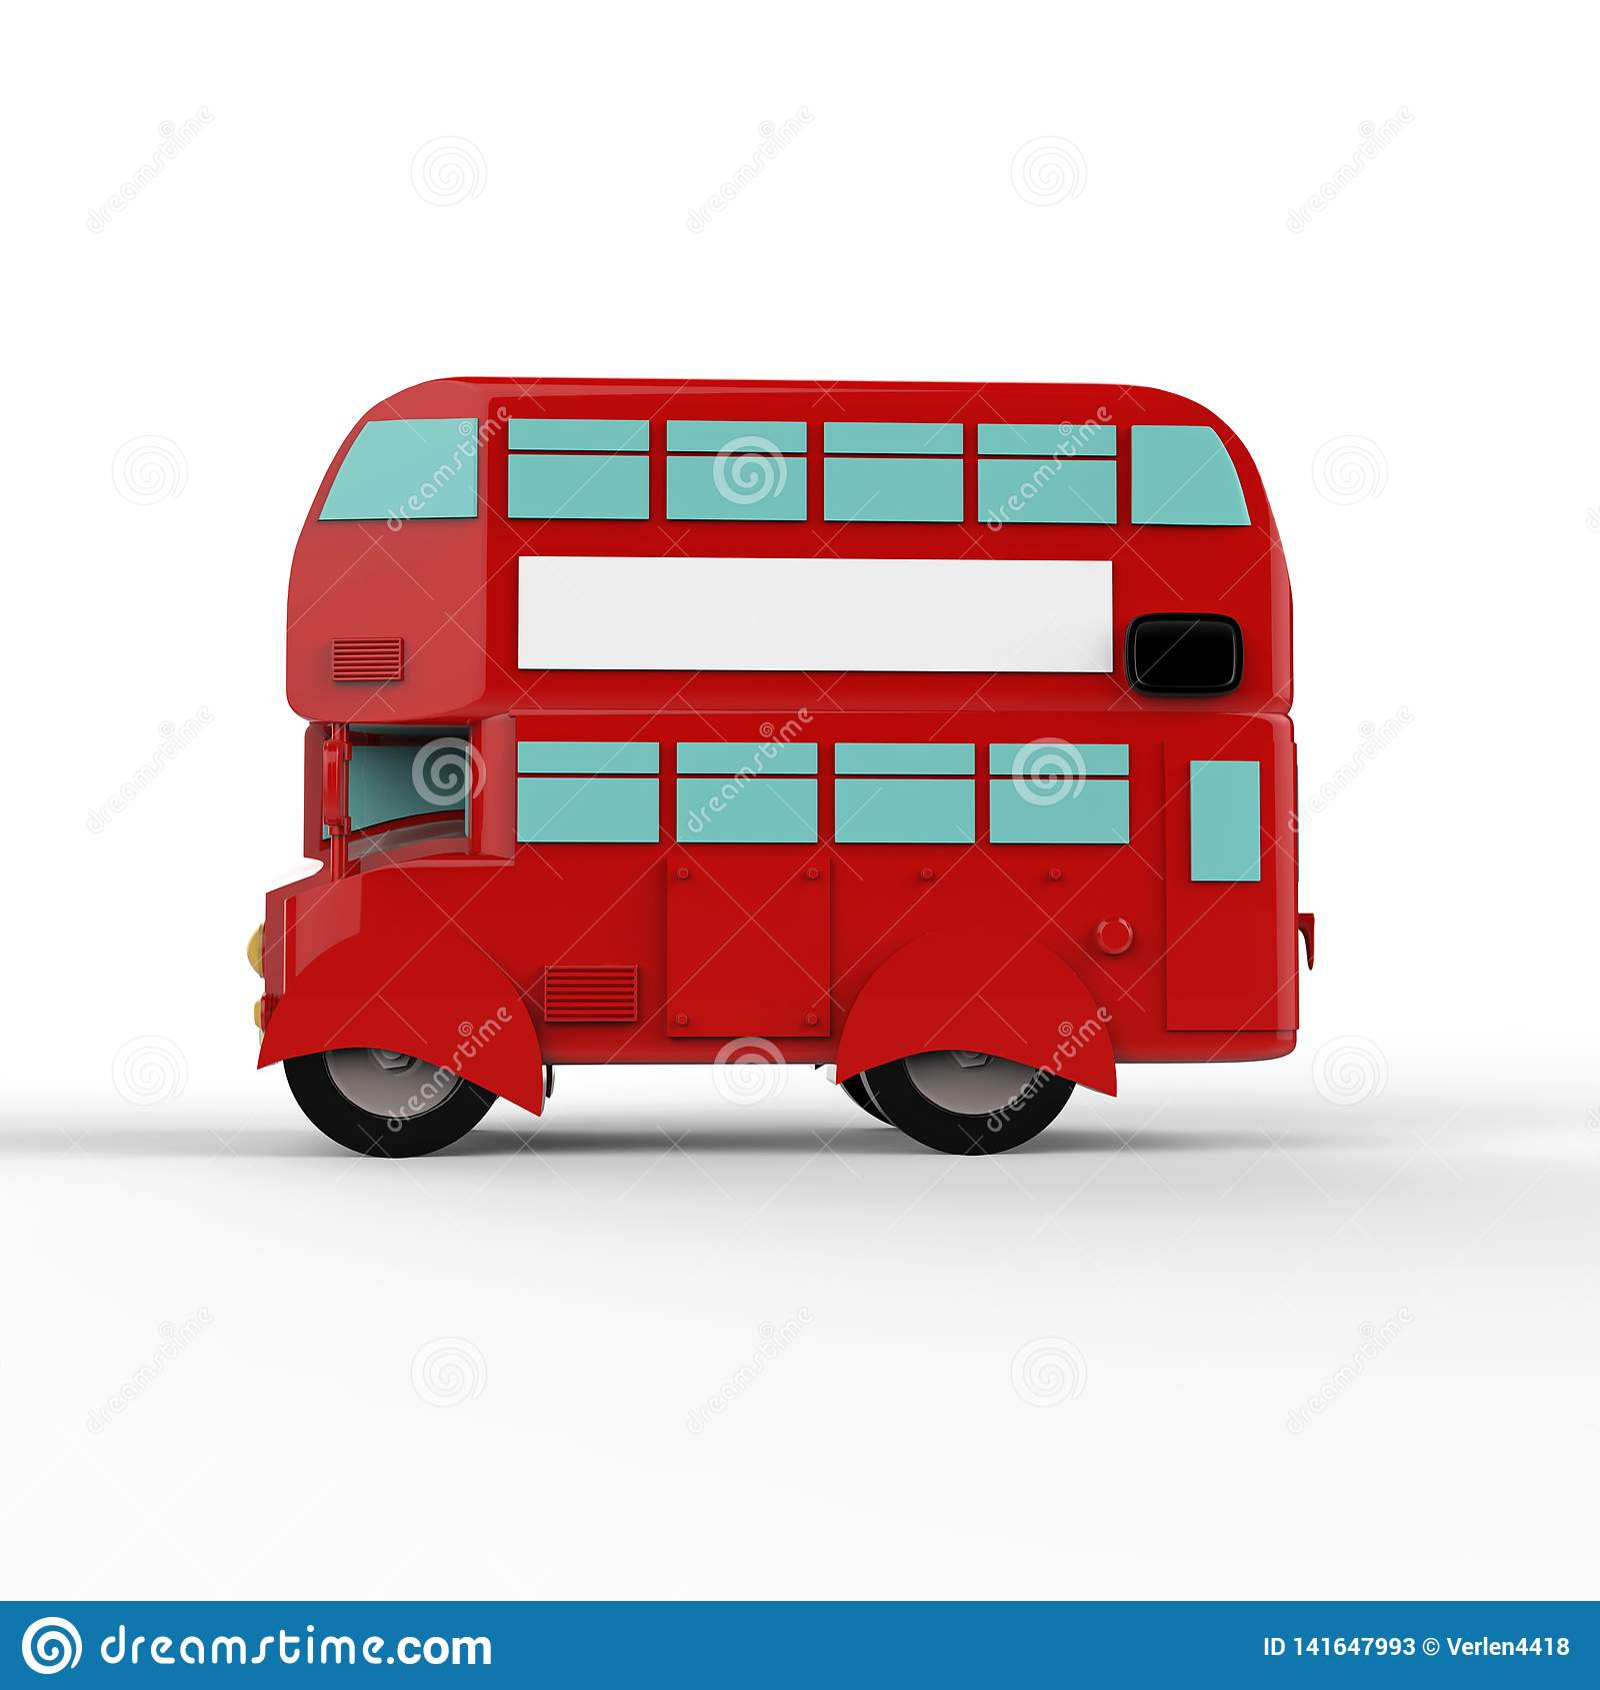 Fashion london doubledecker red bus. 3d render